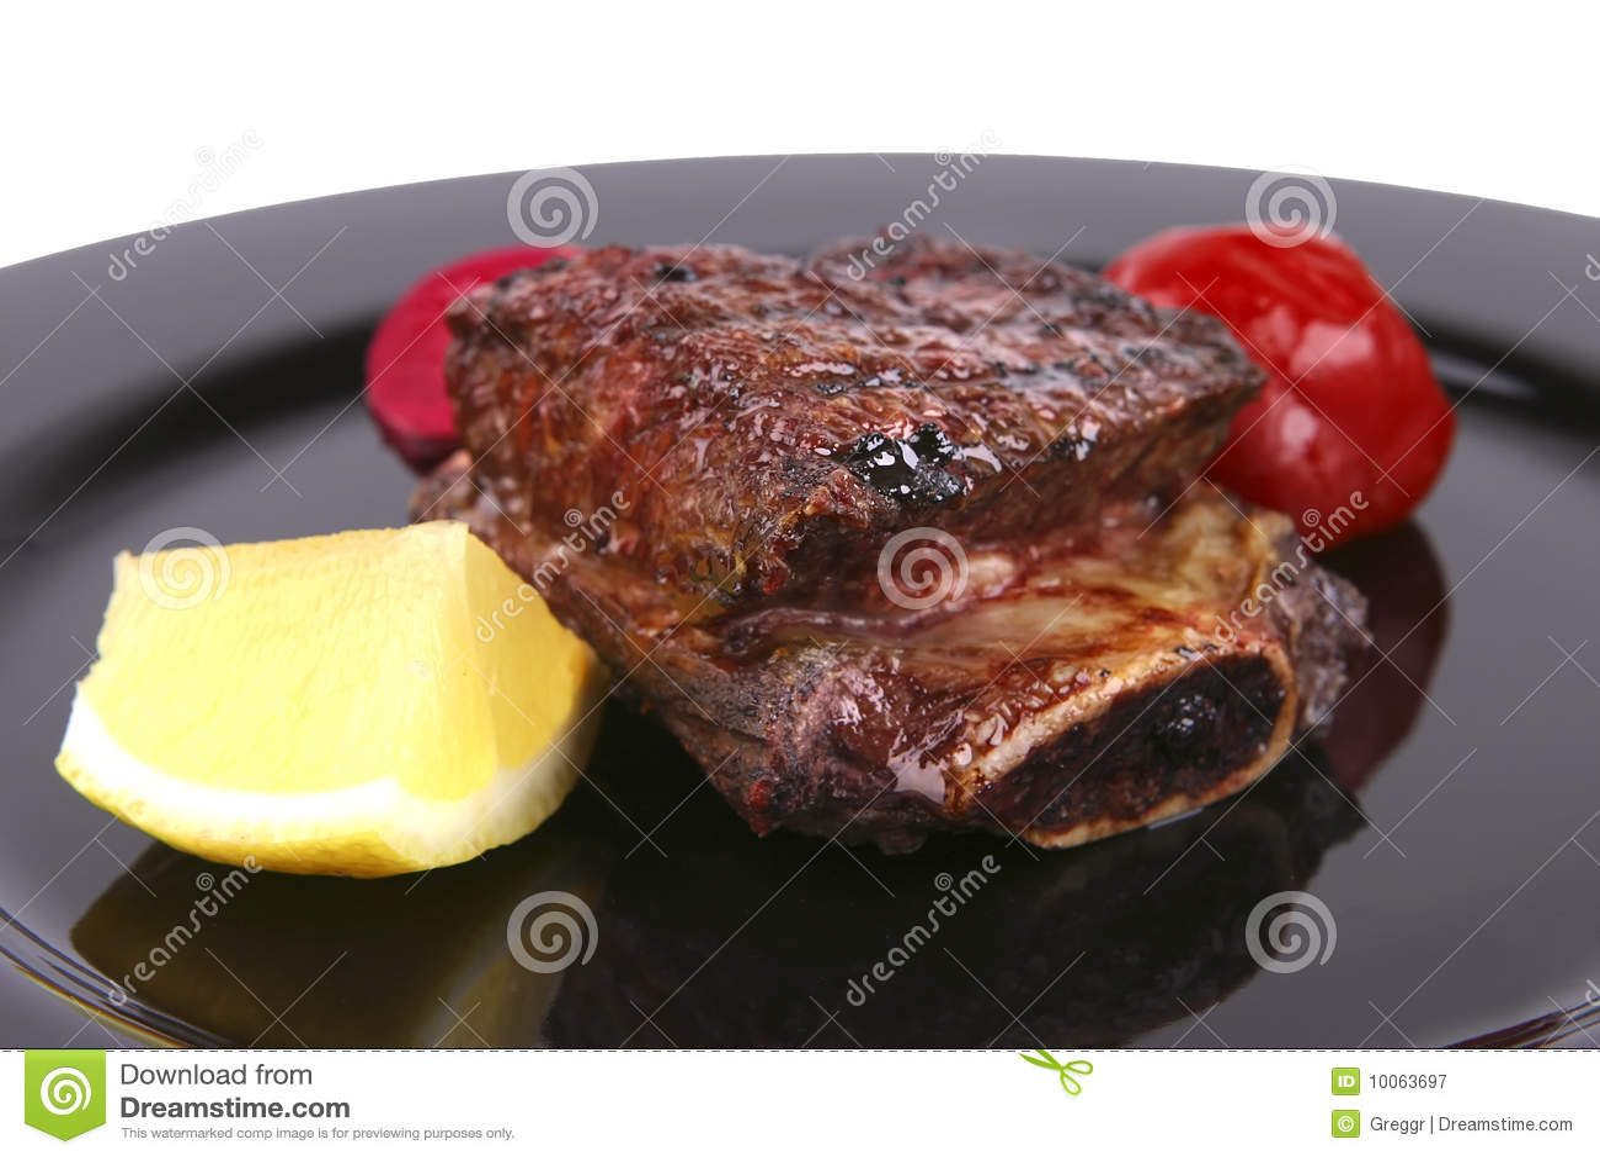 Reforços no prato preto